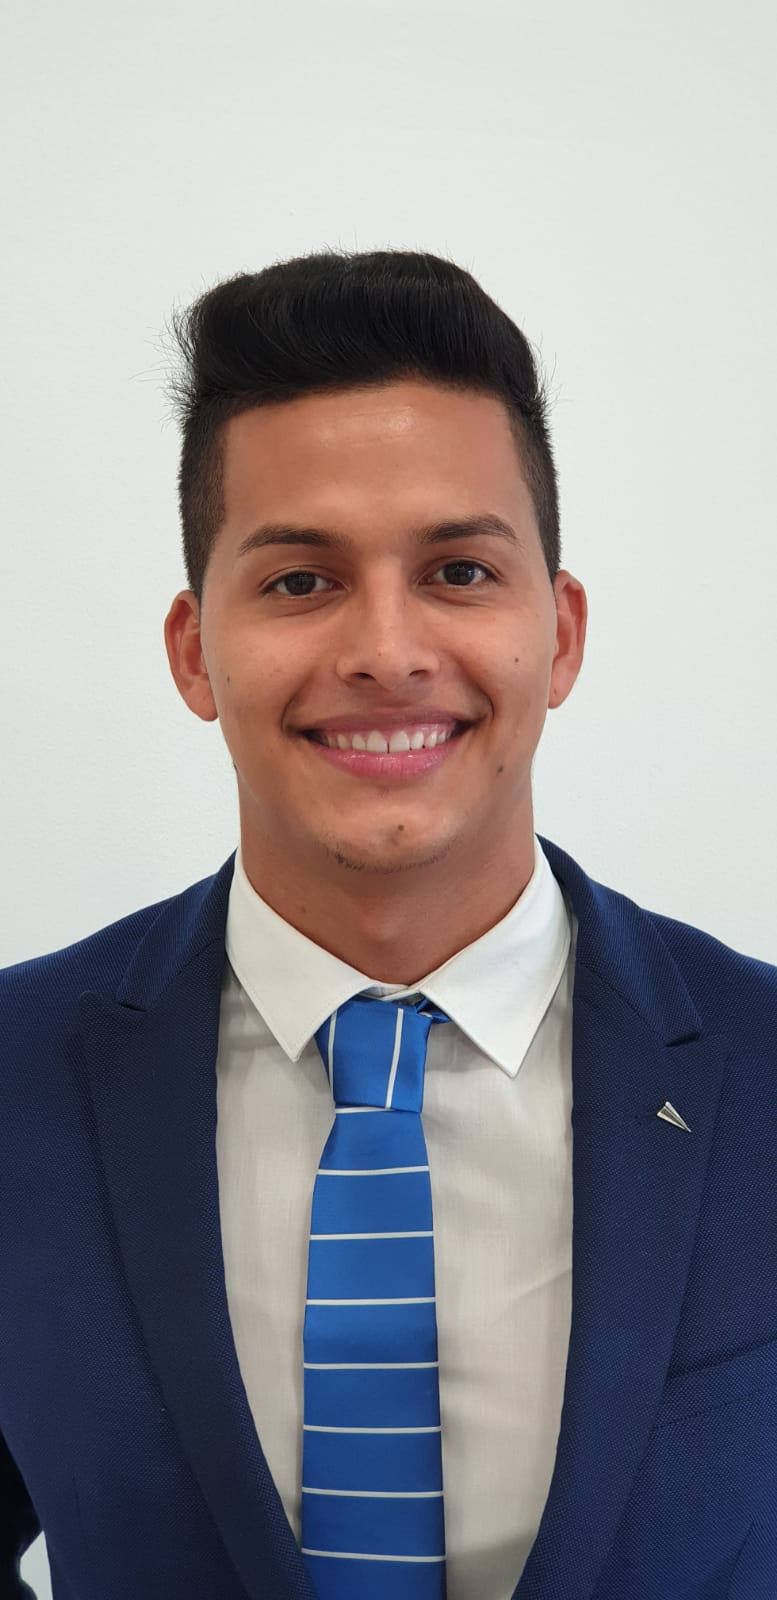 David Igleias